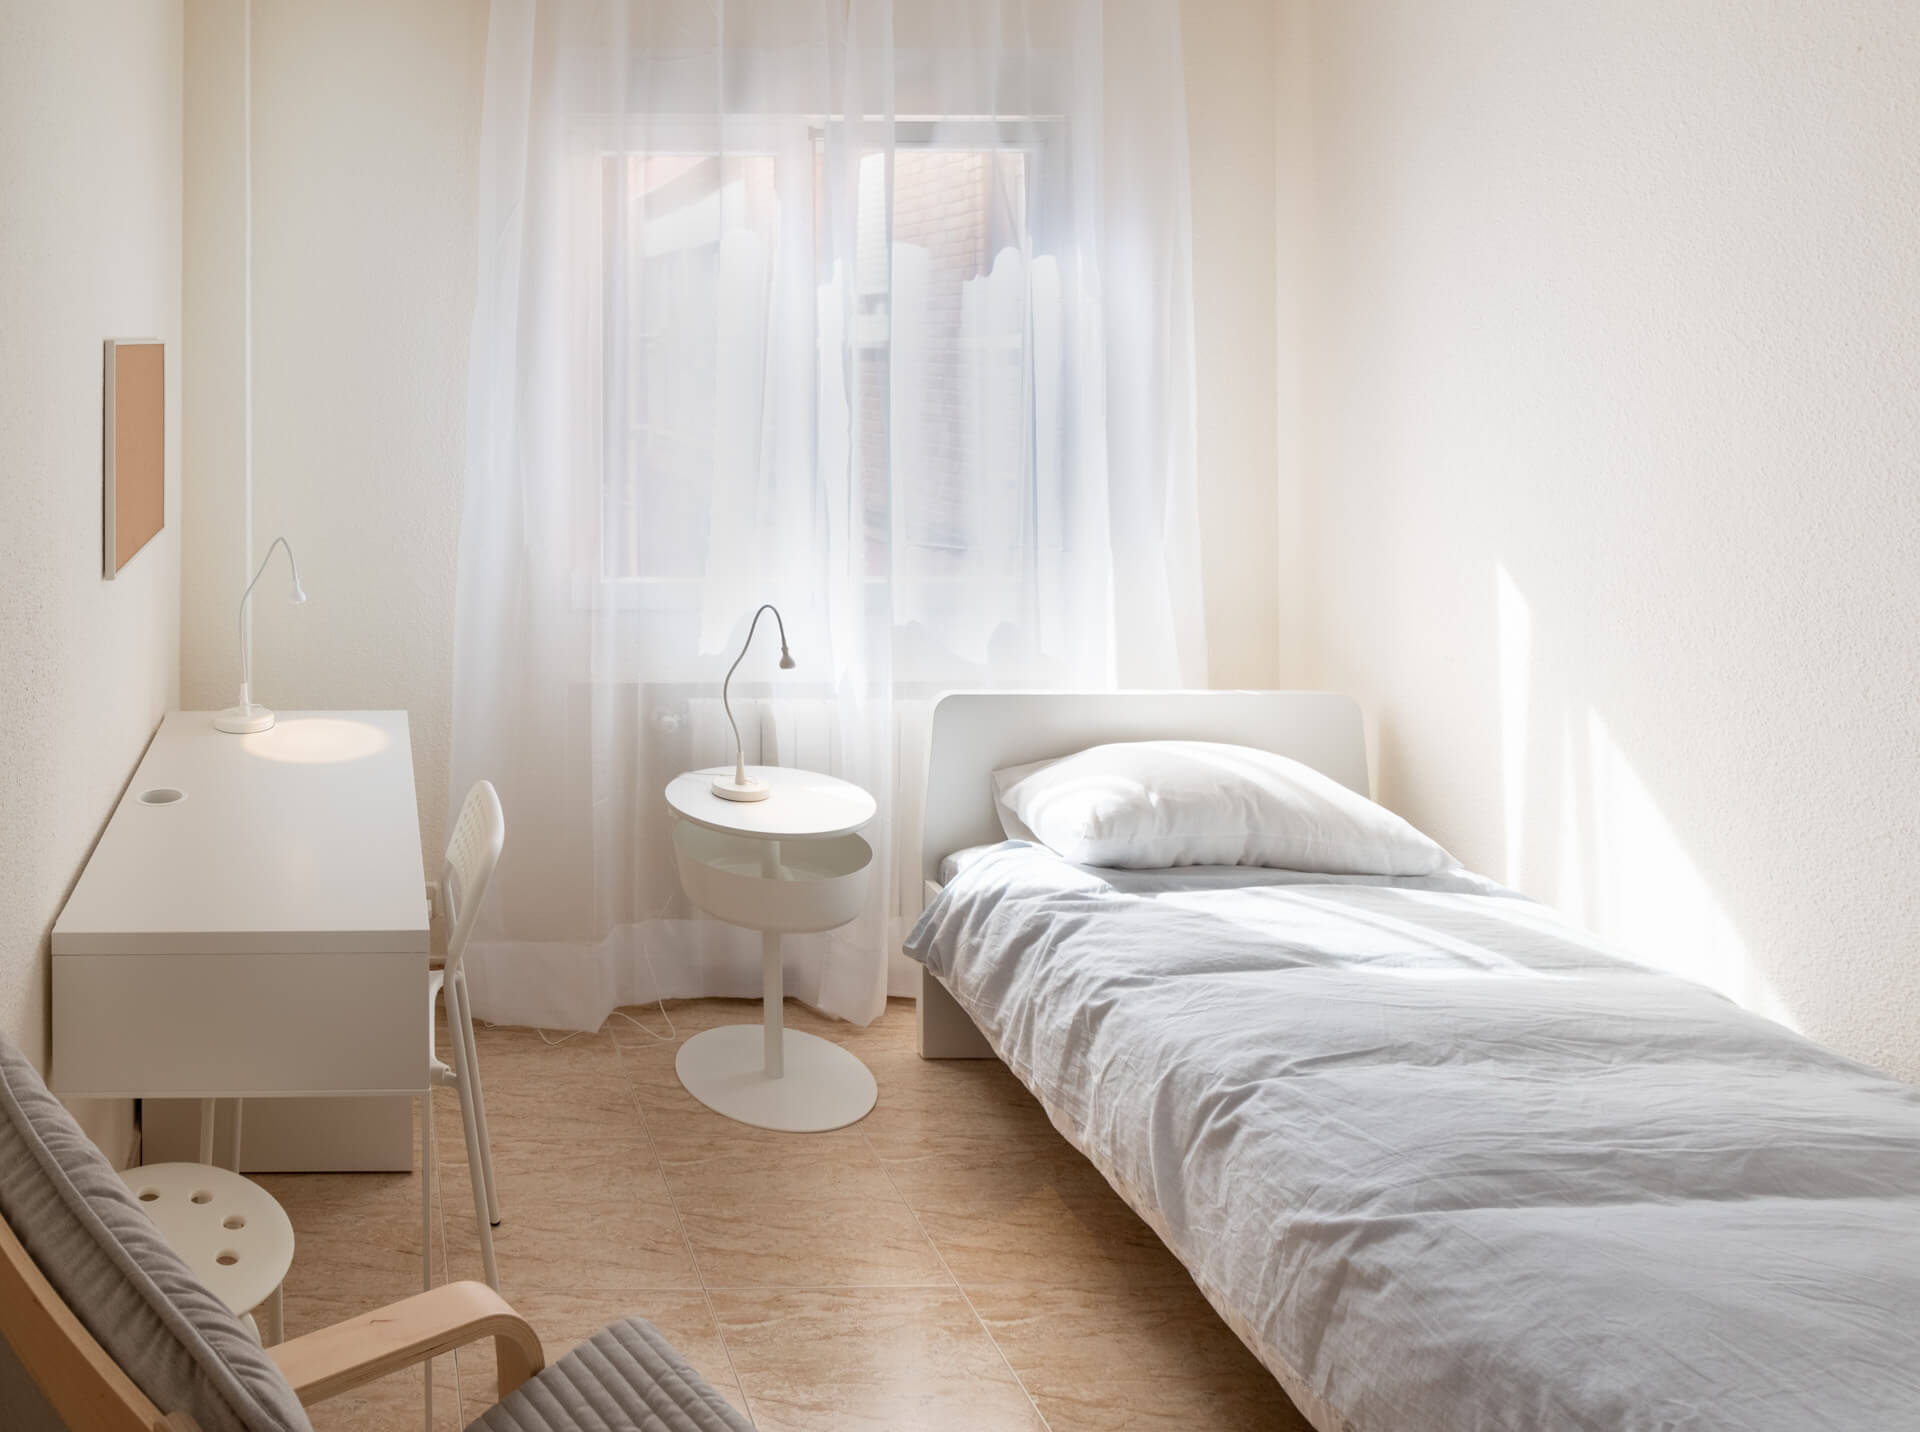 Alquiler habitación Palacio de Hielo - Hortaleza